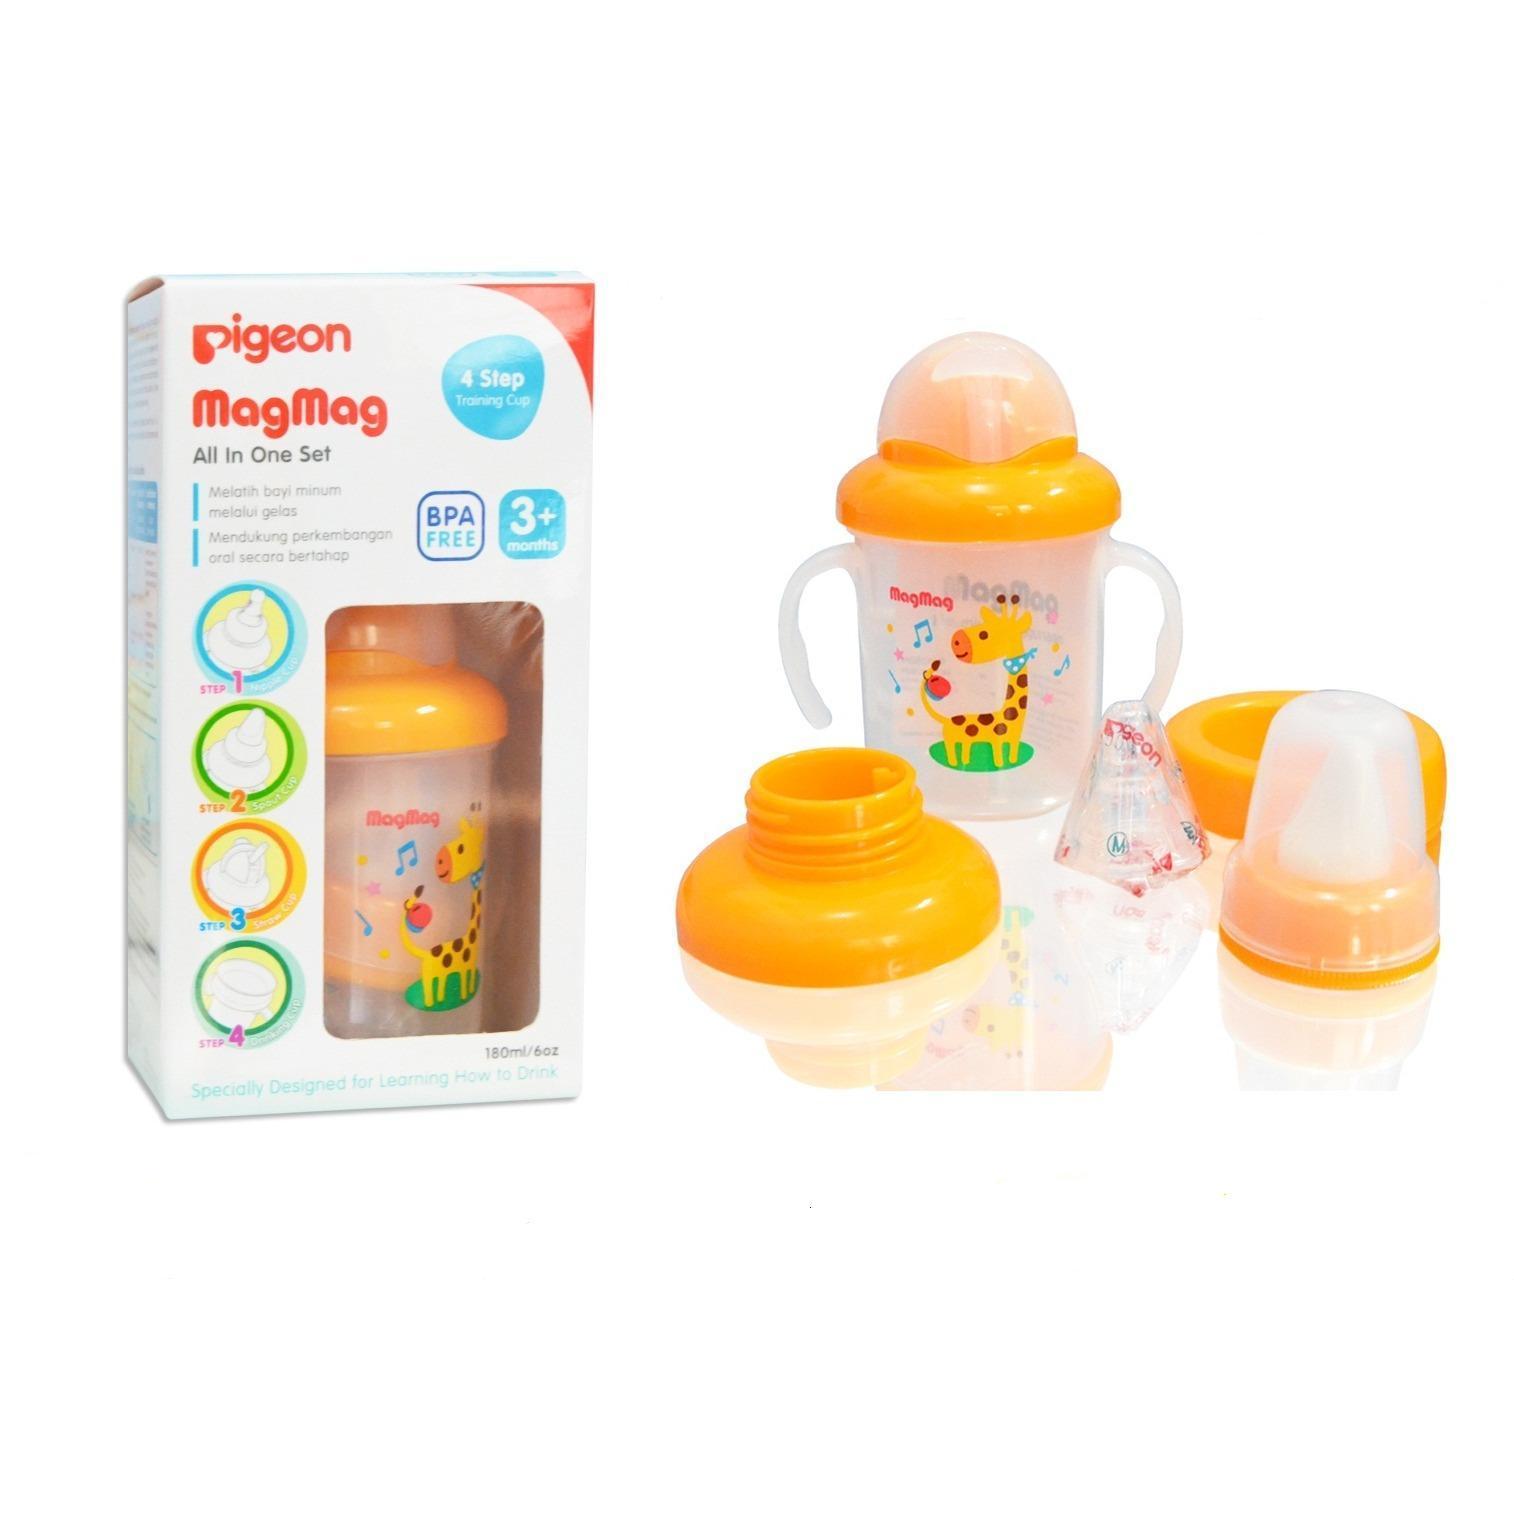 Pigeon MagMag All In One Set 4 Step - Mag Mag Botol Minum Bayi 4 Step